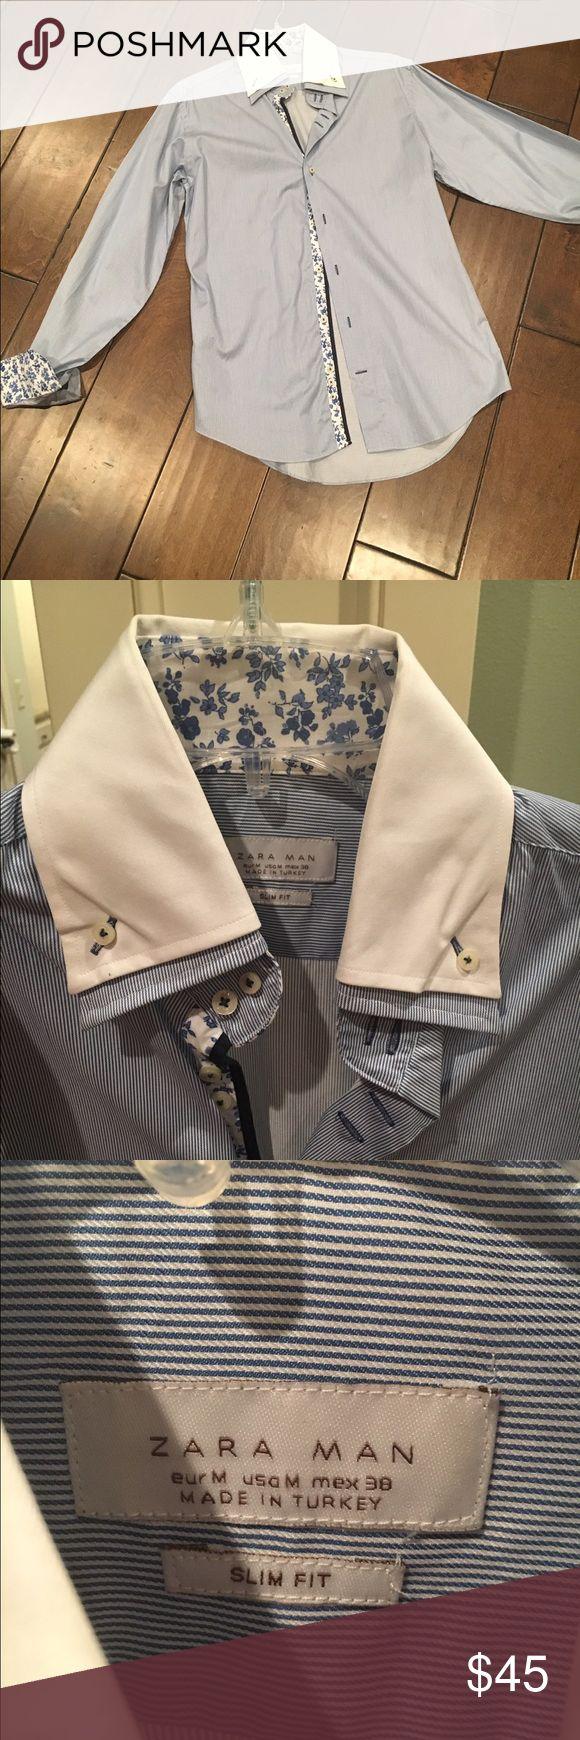 Zara slim fit dress shirt Worn once Zara dress shirt size m slim fit Zara Shirts Dress Shirts